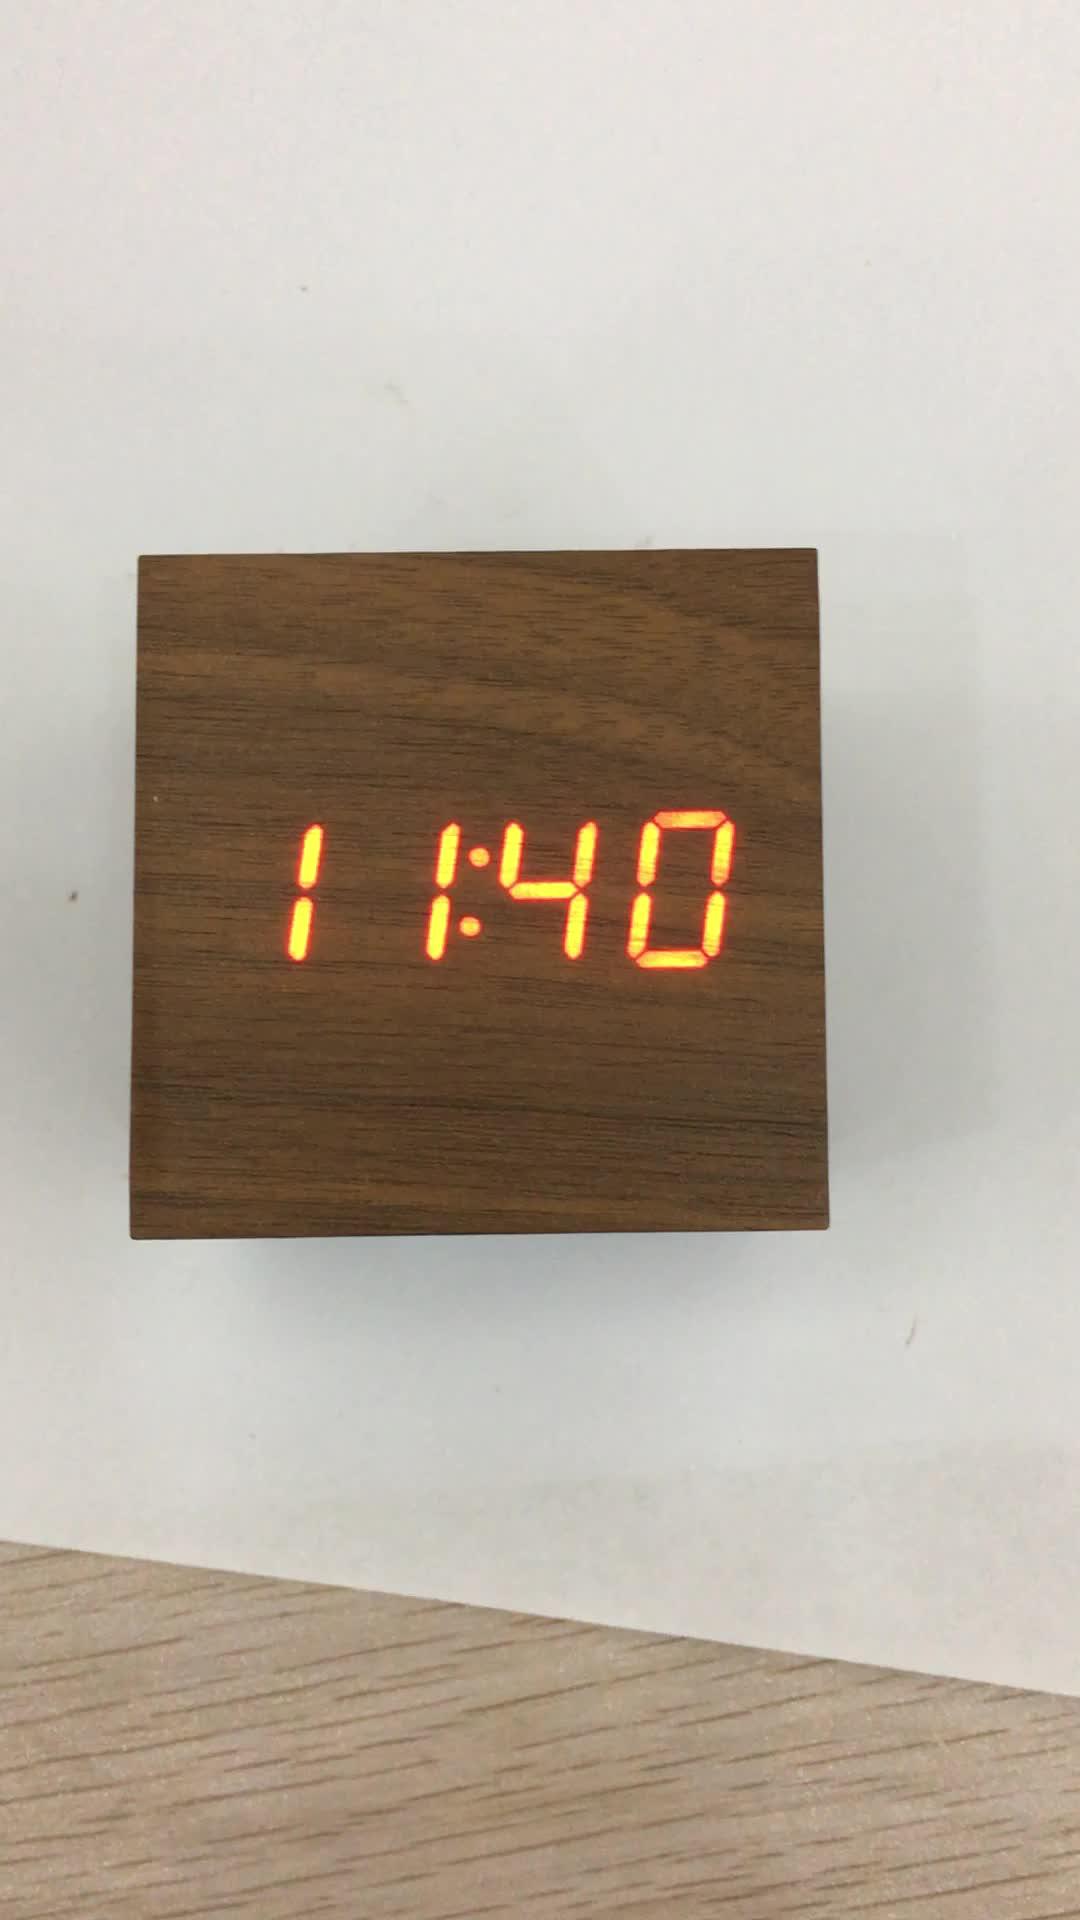 new material Digital Desk Clock Wood Alarm Clock ROHS wooden led digital alarm clock